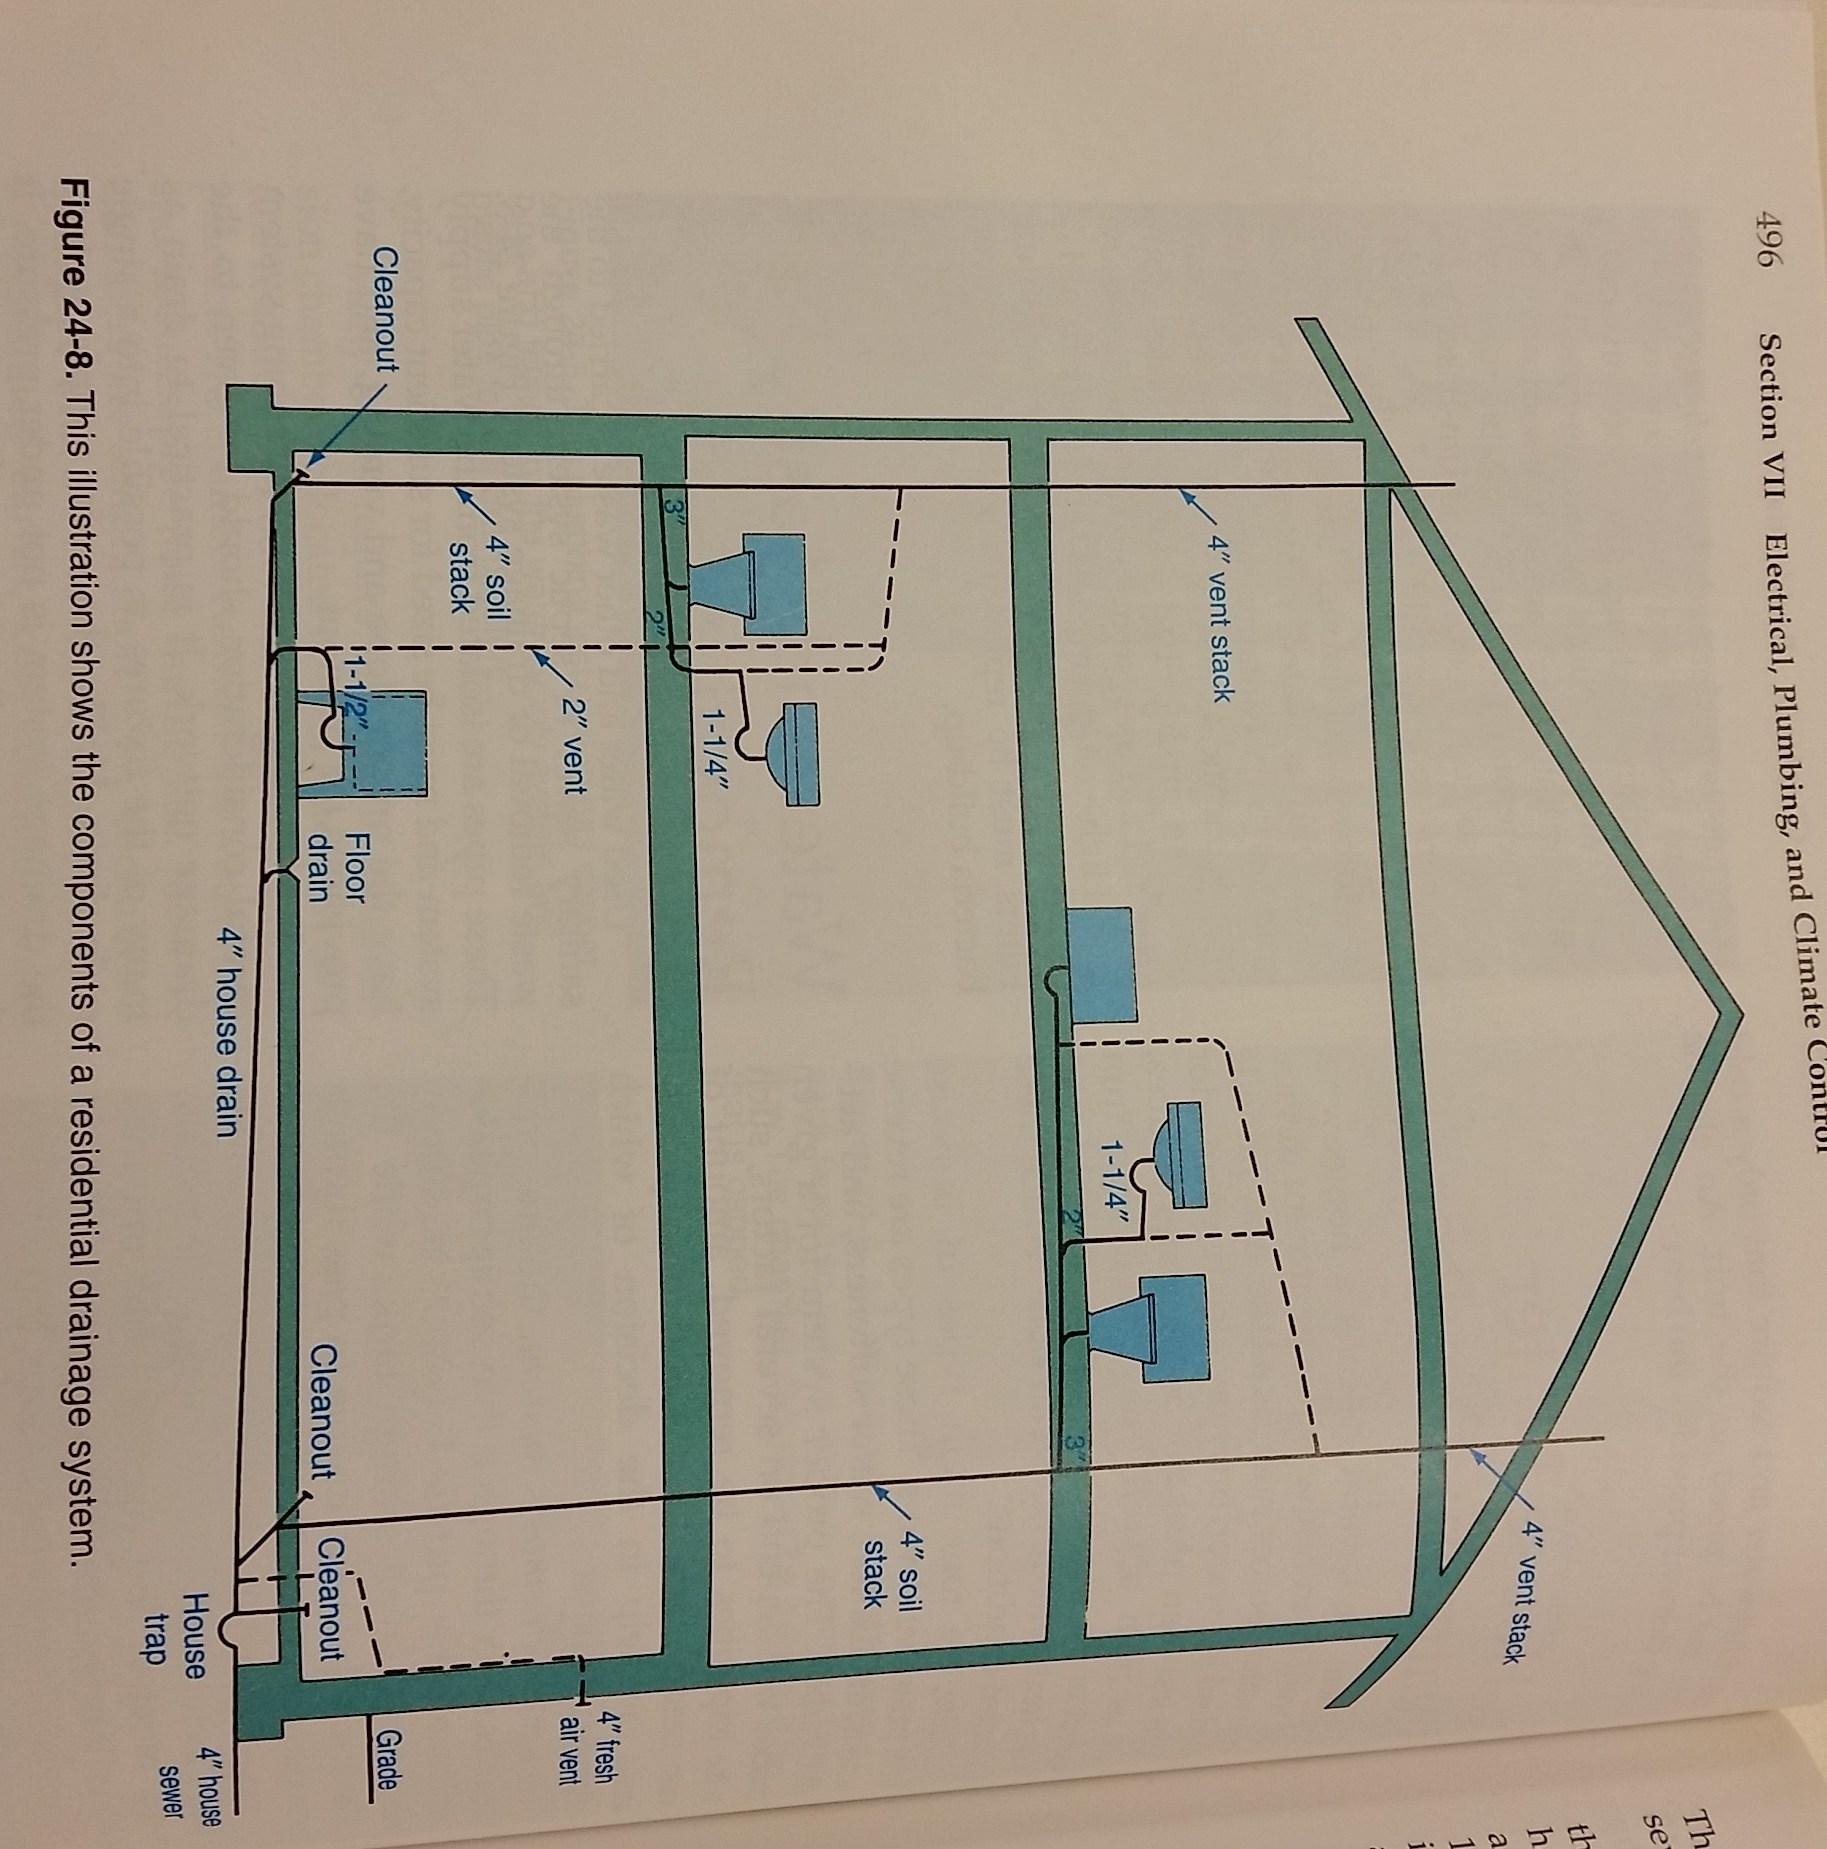 plumbing sanitary riser diagram root cause analysis fishbone example mugno a honors architectural design